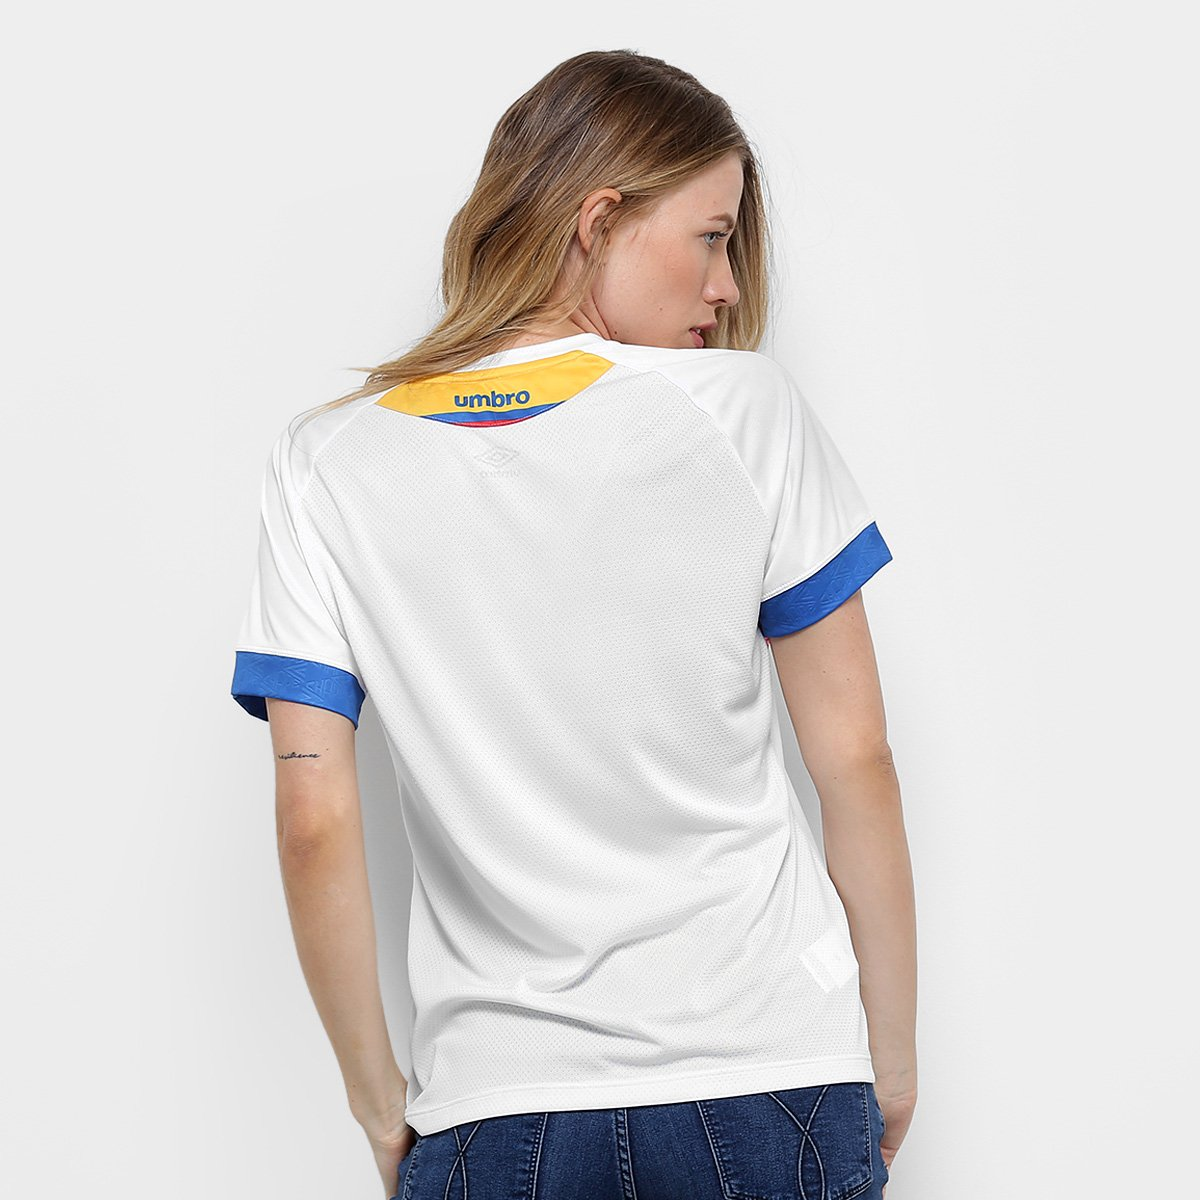 Pasion Umbro Torcedor e Chapecoense Azul Feminina La 2018 s II Branco Camisa n° 1yHqYcq